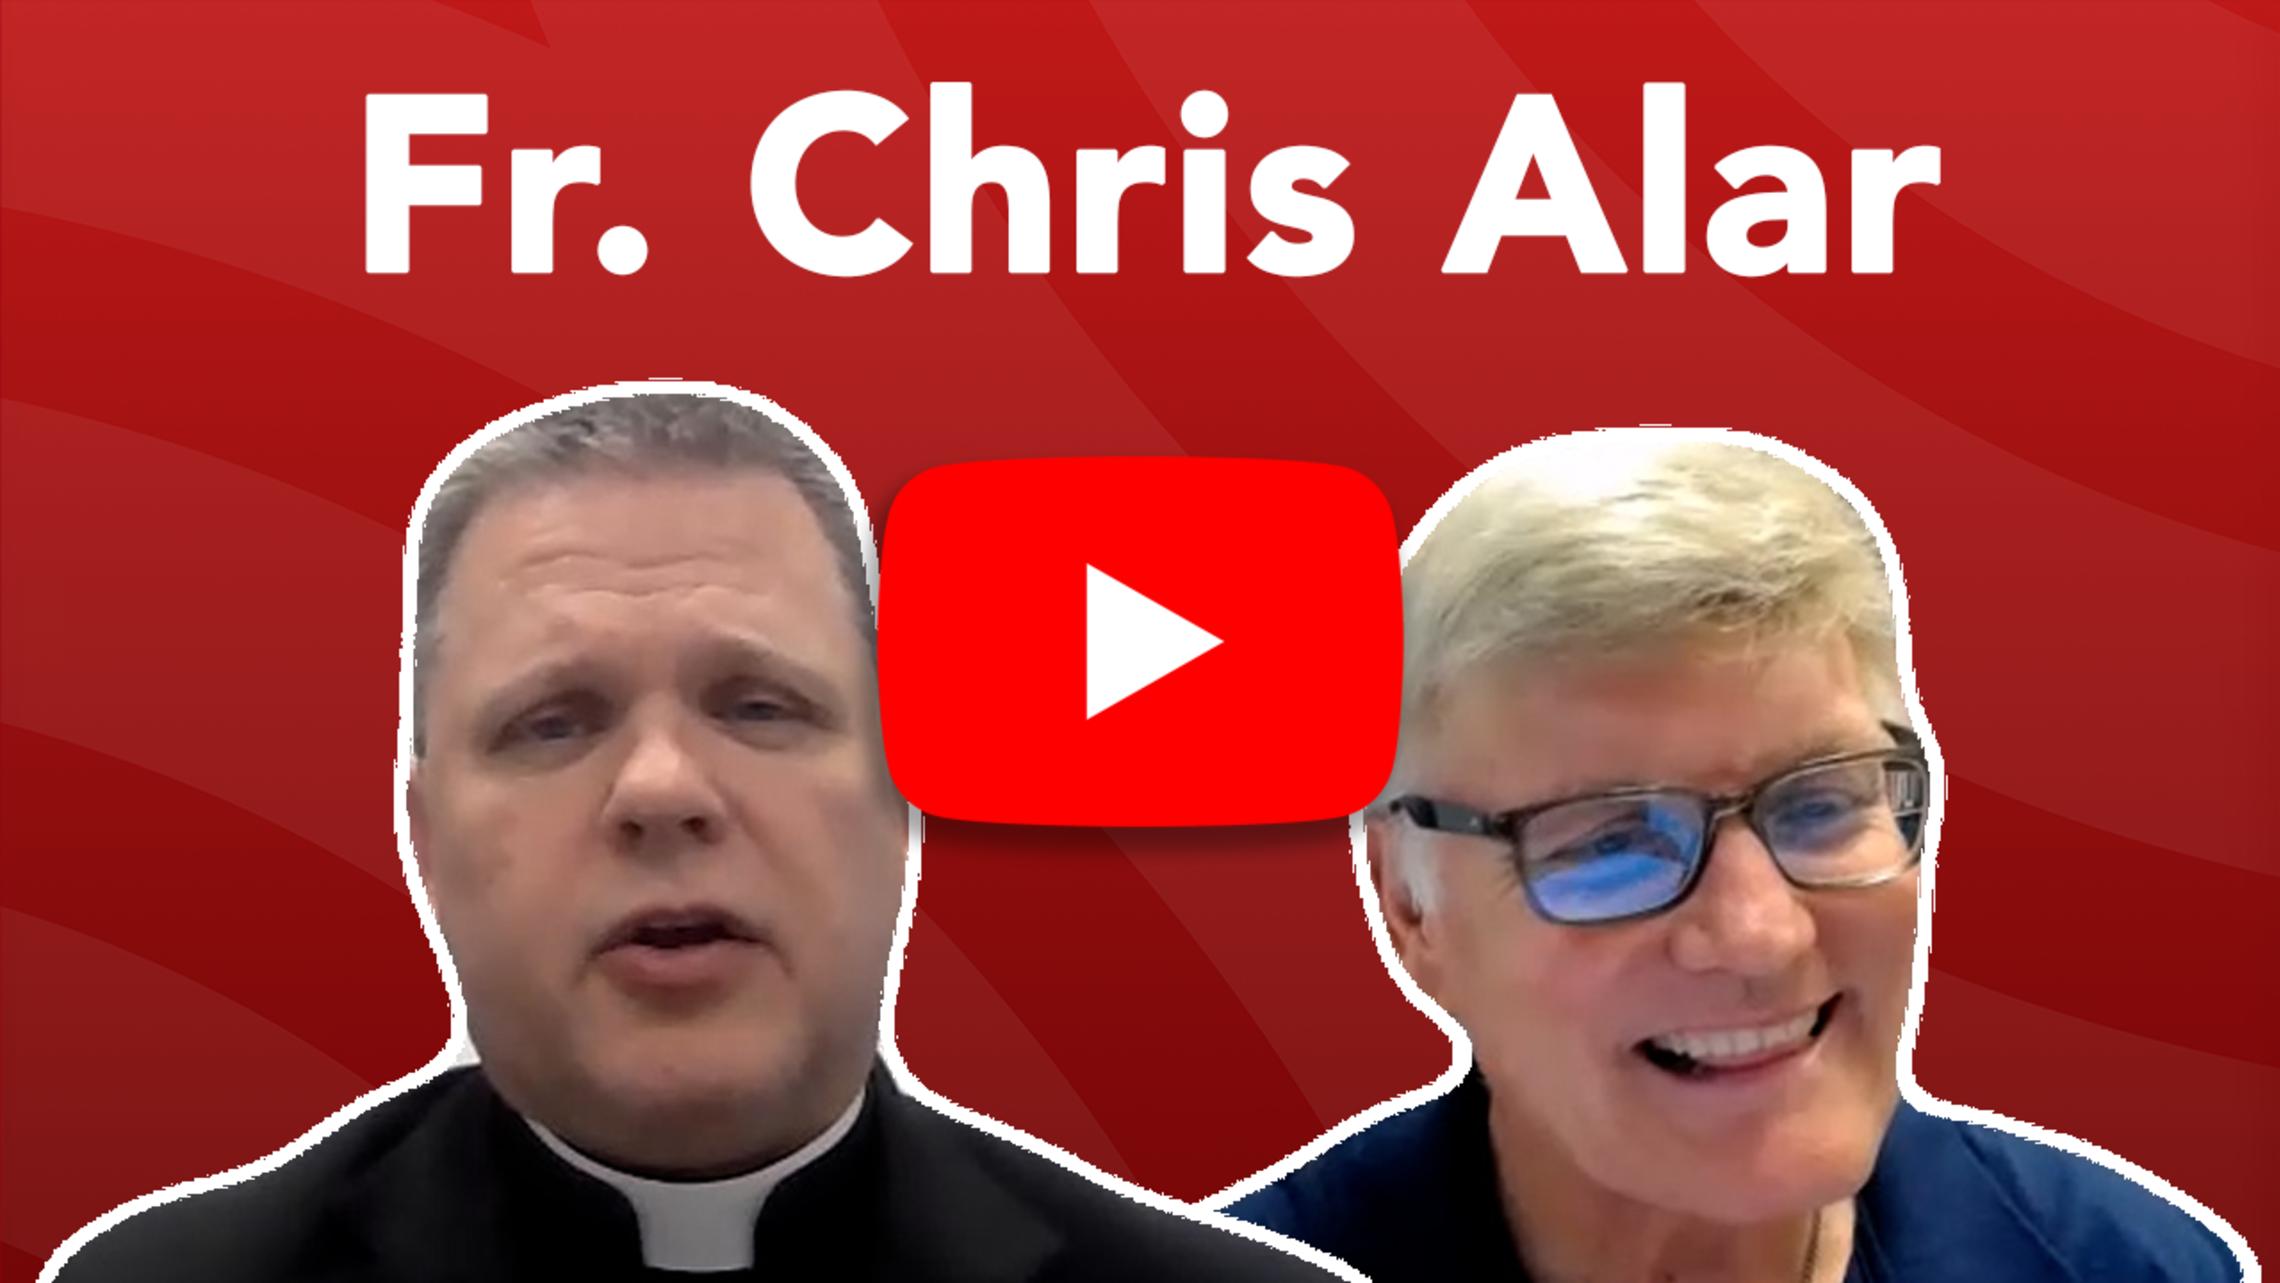 Fr. Chris Alar Tn Website